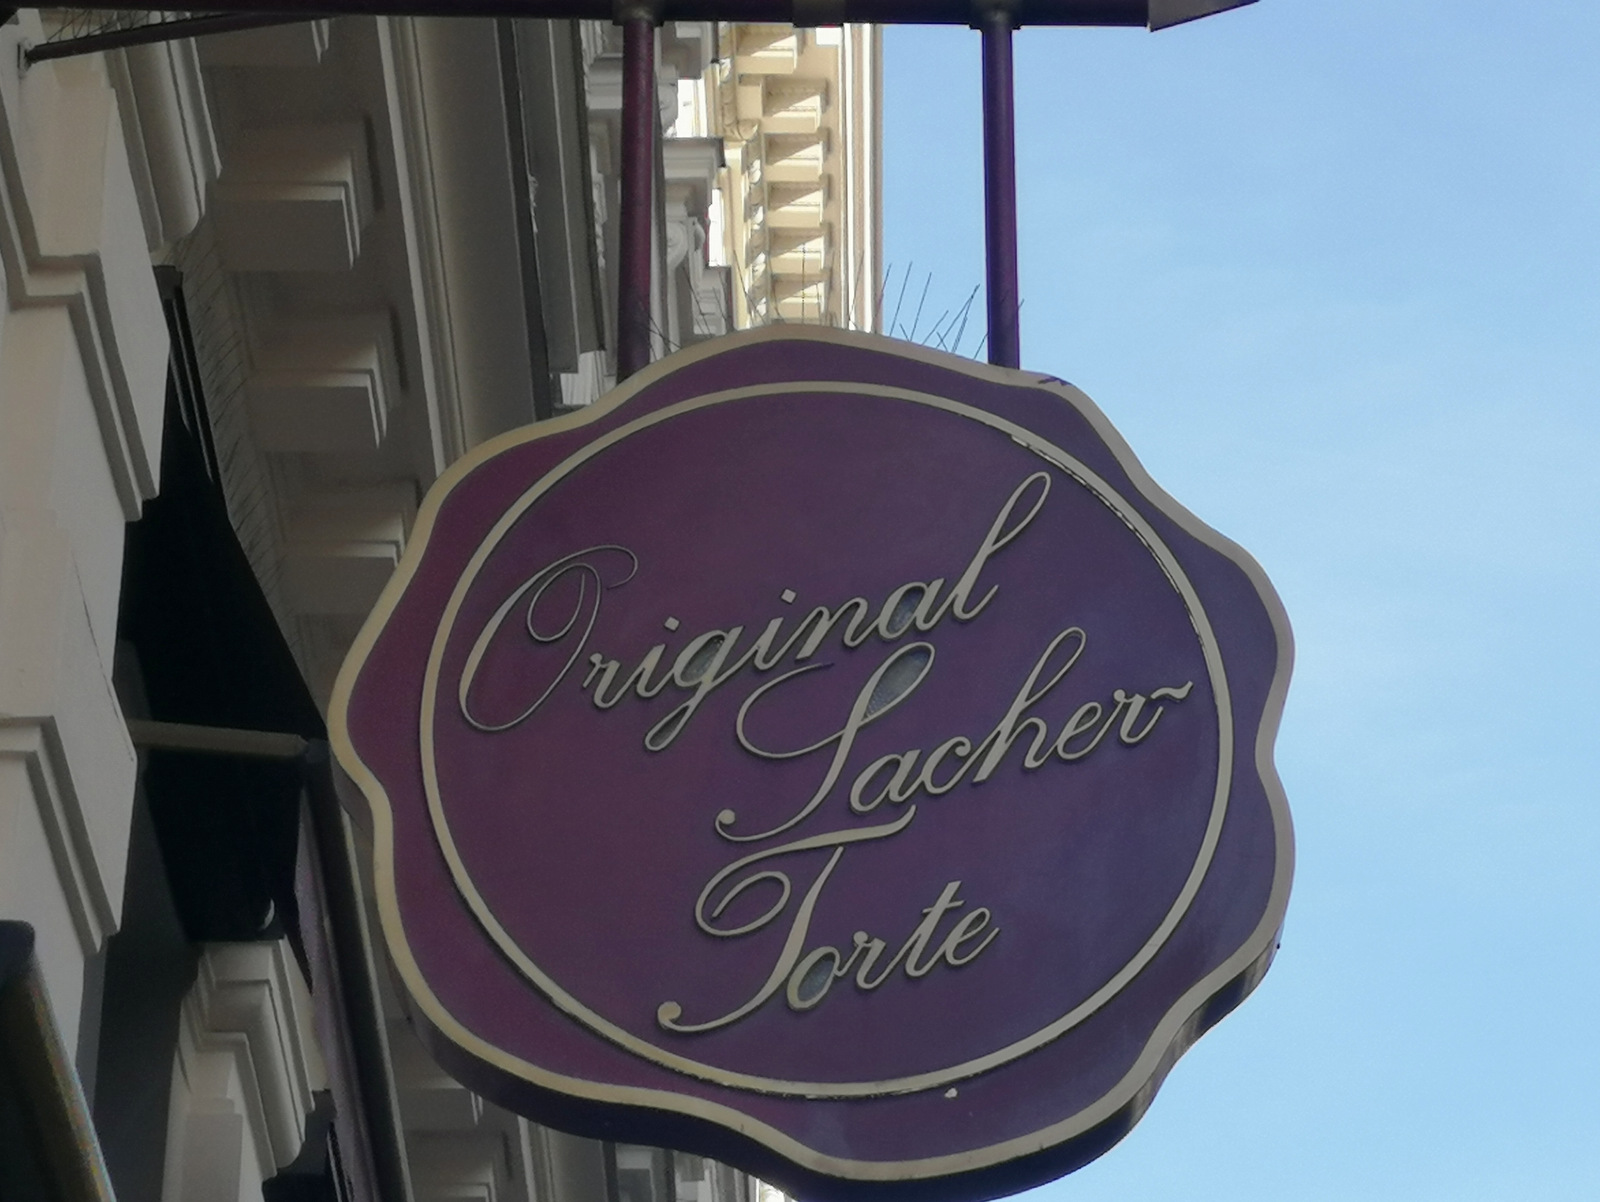 Originalna Sacher tora v istoimenskem hotelu